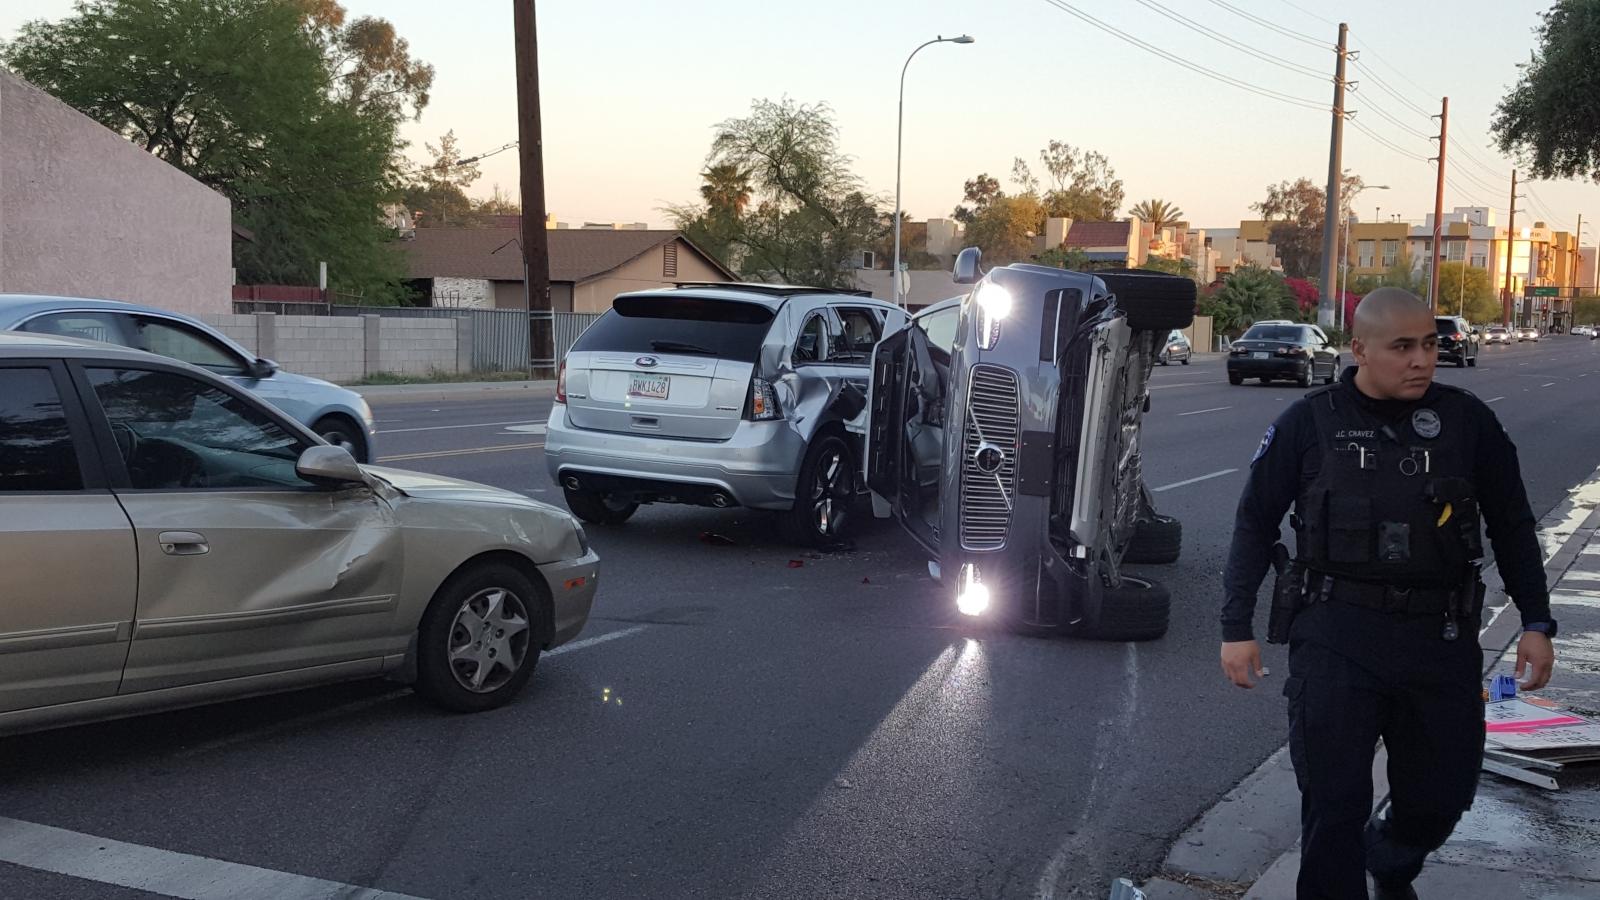 Uber grounds entire self-driving car fleet following a serious crash in Arizona